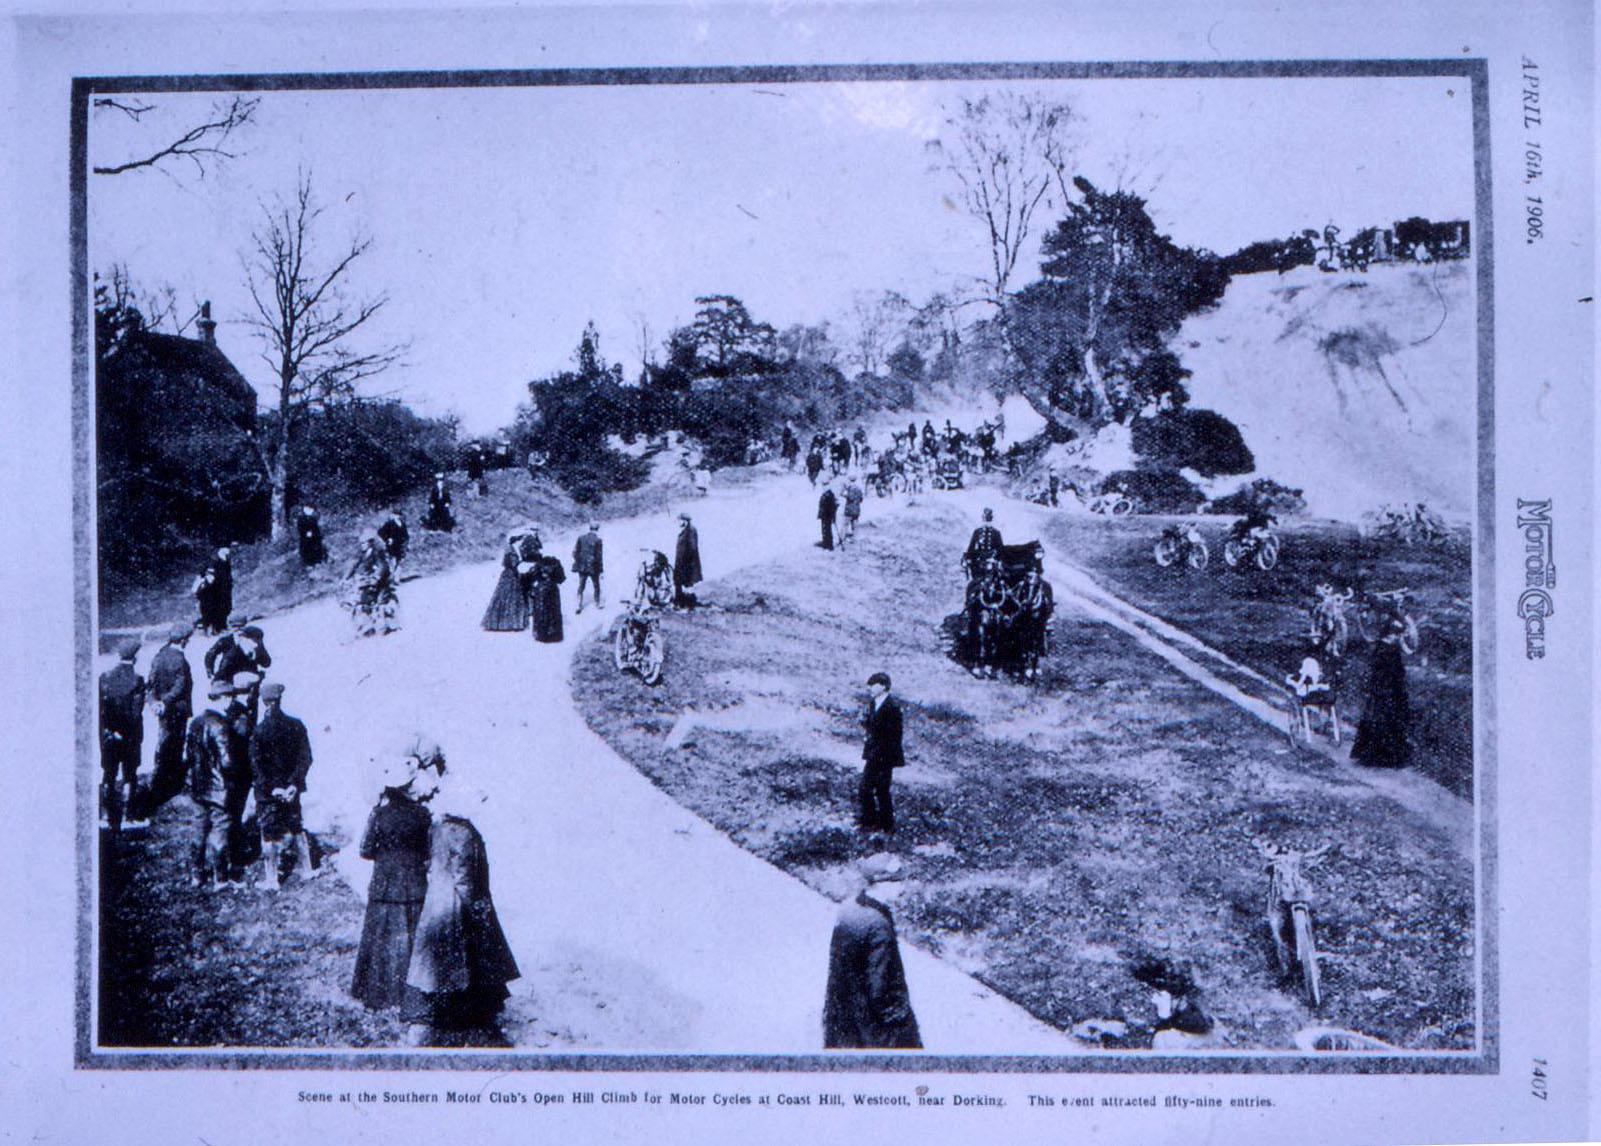 Southern Motor Club Open Hill Climb at Coast Hill 1906